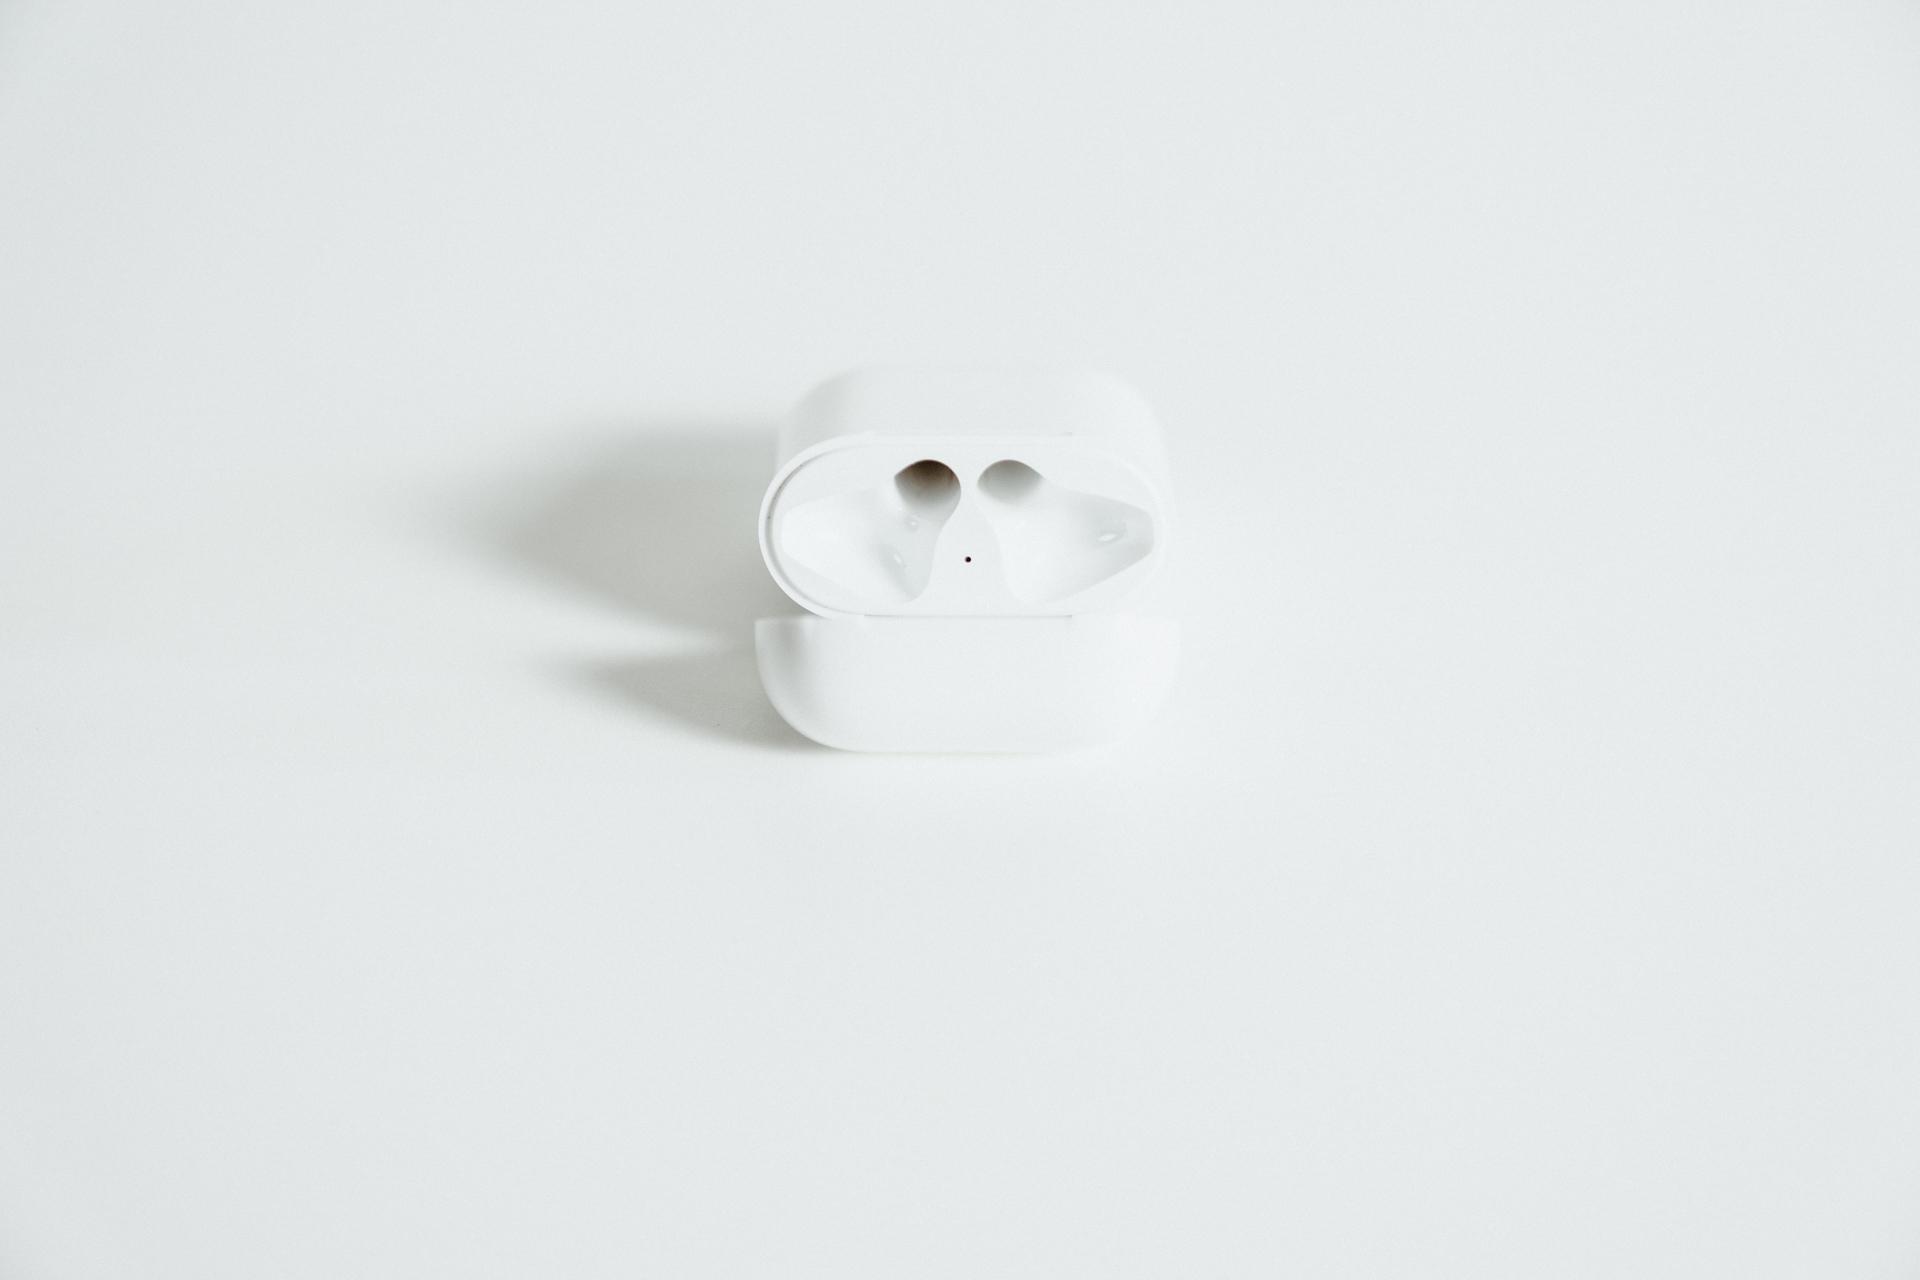 Apple-AirPods-14.jpg